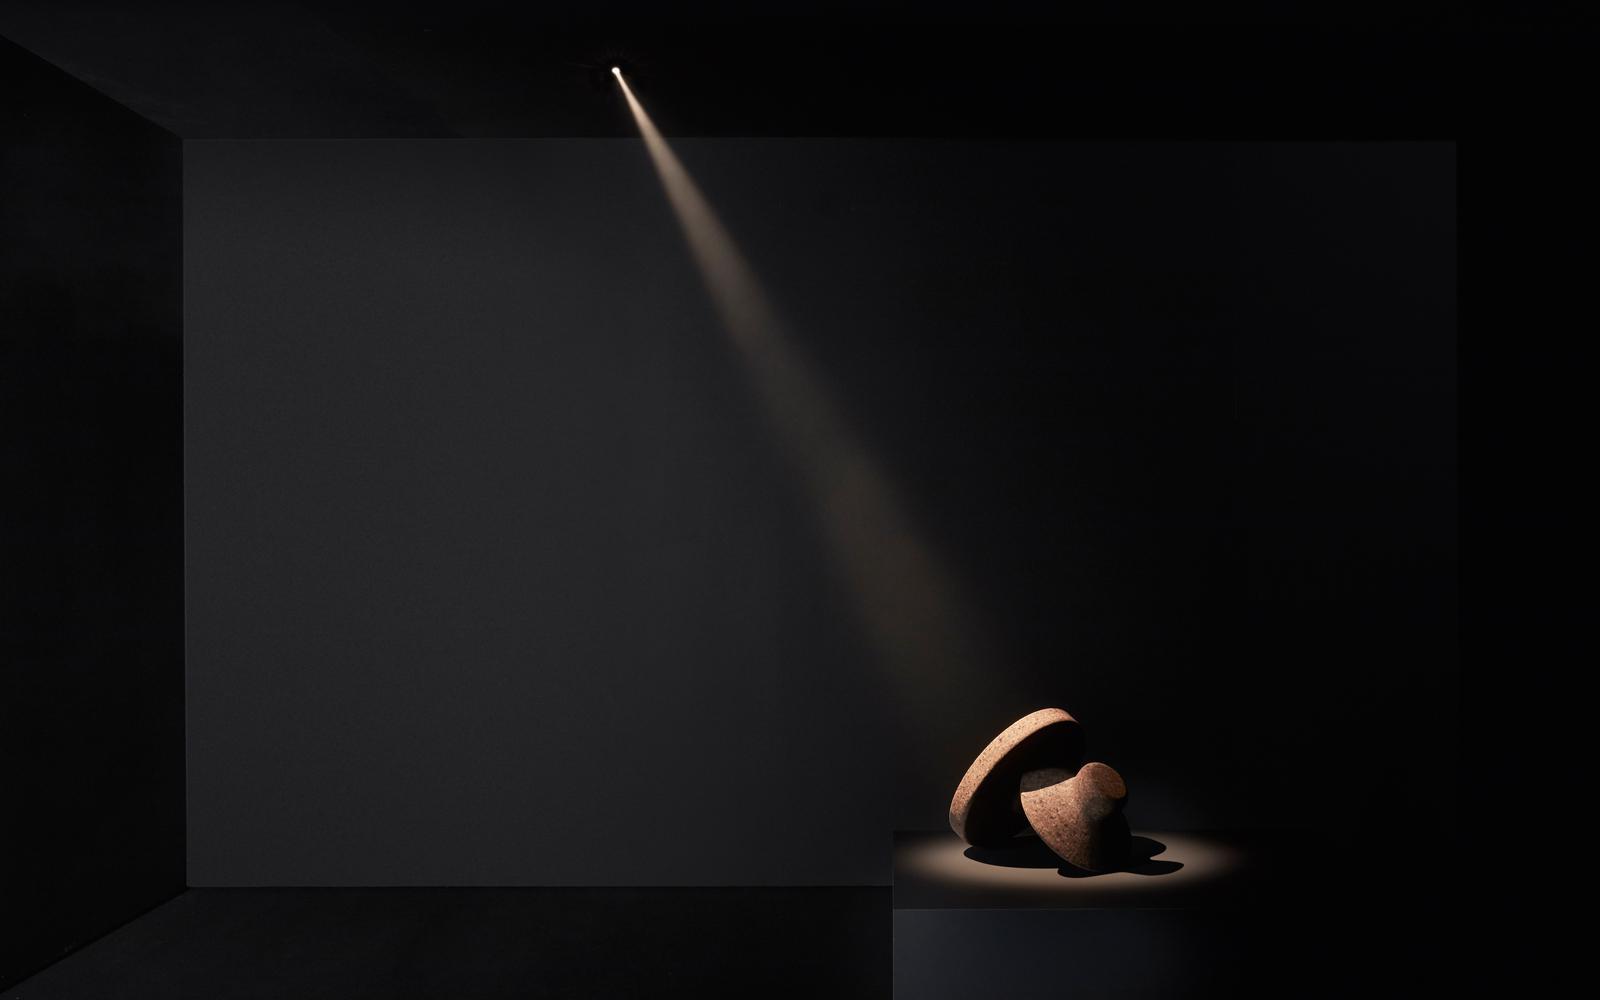 Verlichting, the art of living,